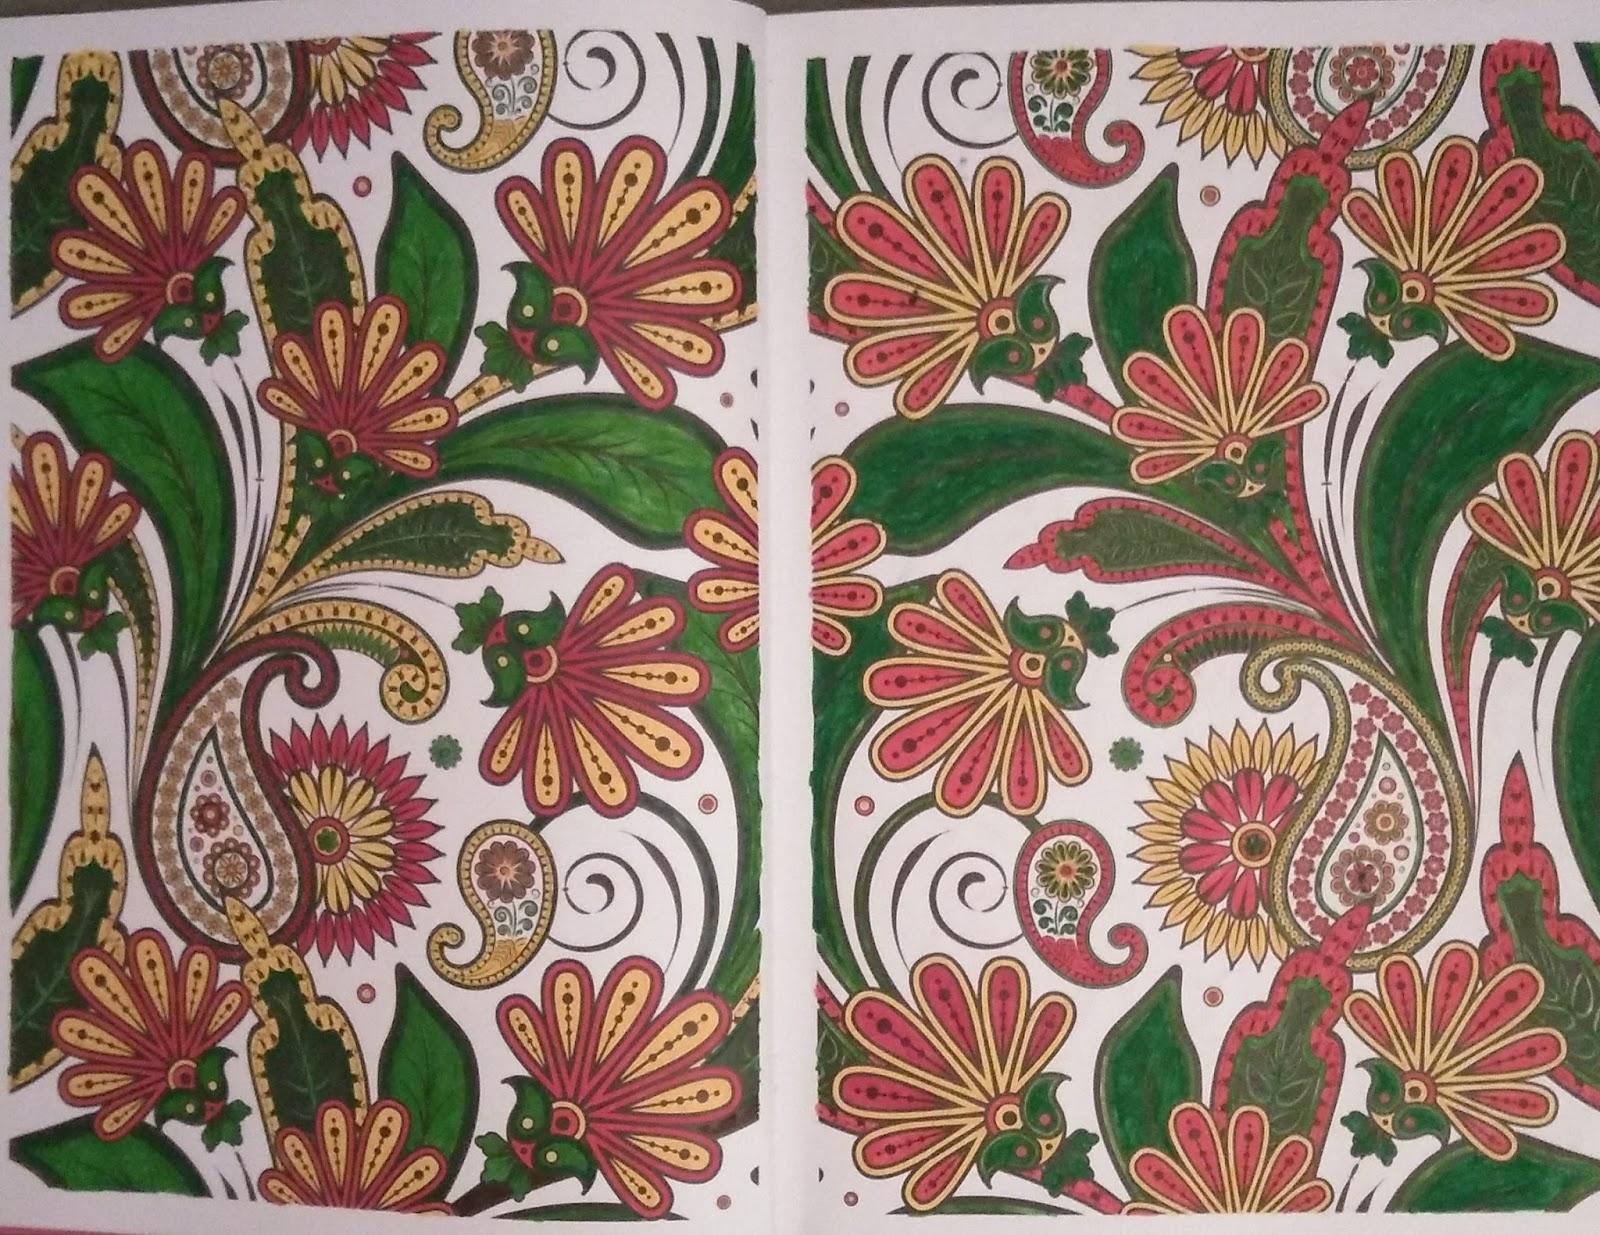 livre art therapie 100 coloriages anti stress dition hachette - Coloriage Anti Stress Hachette